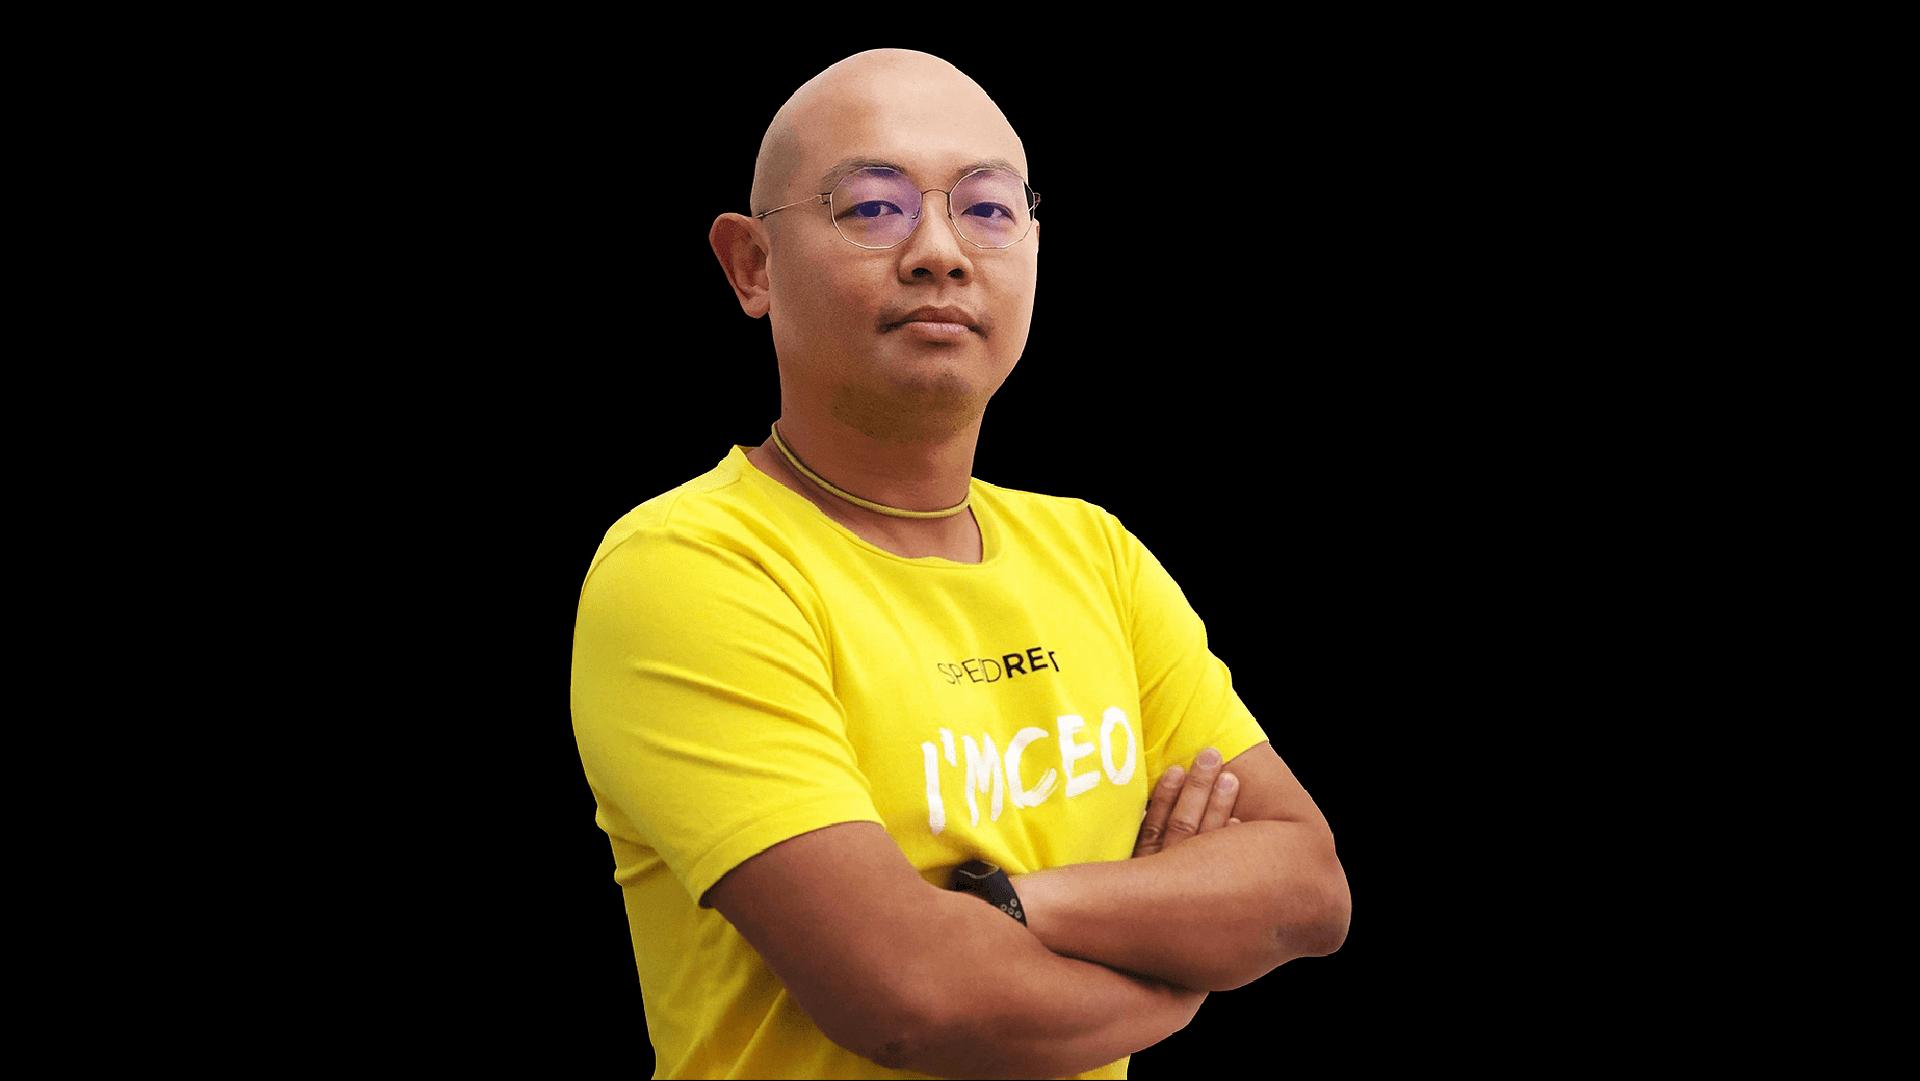 Whei Meng of Speedhome.com Malaysia